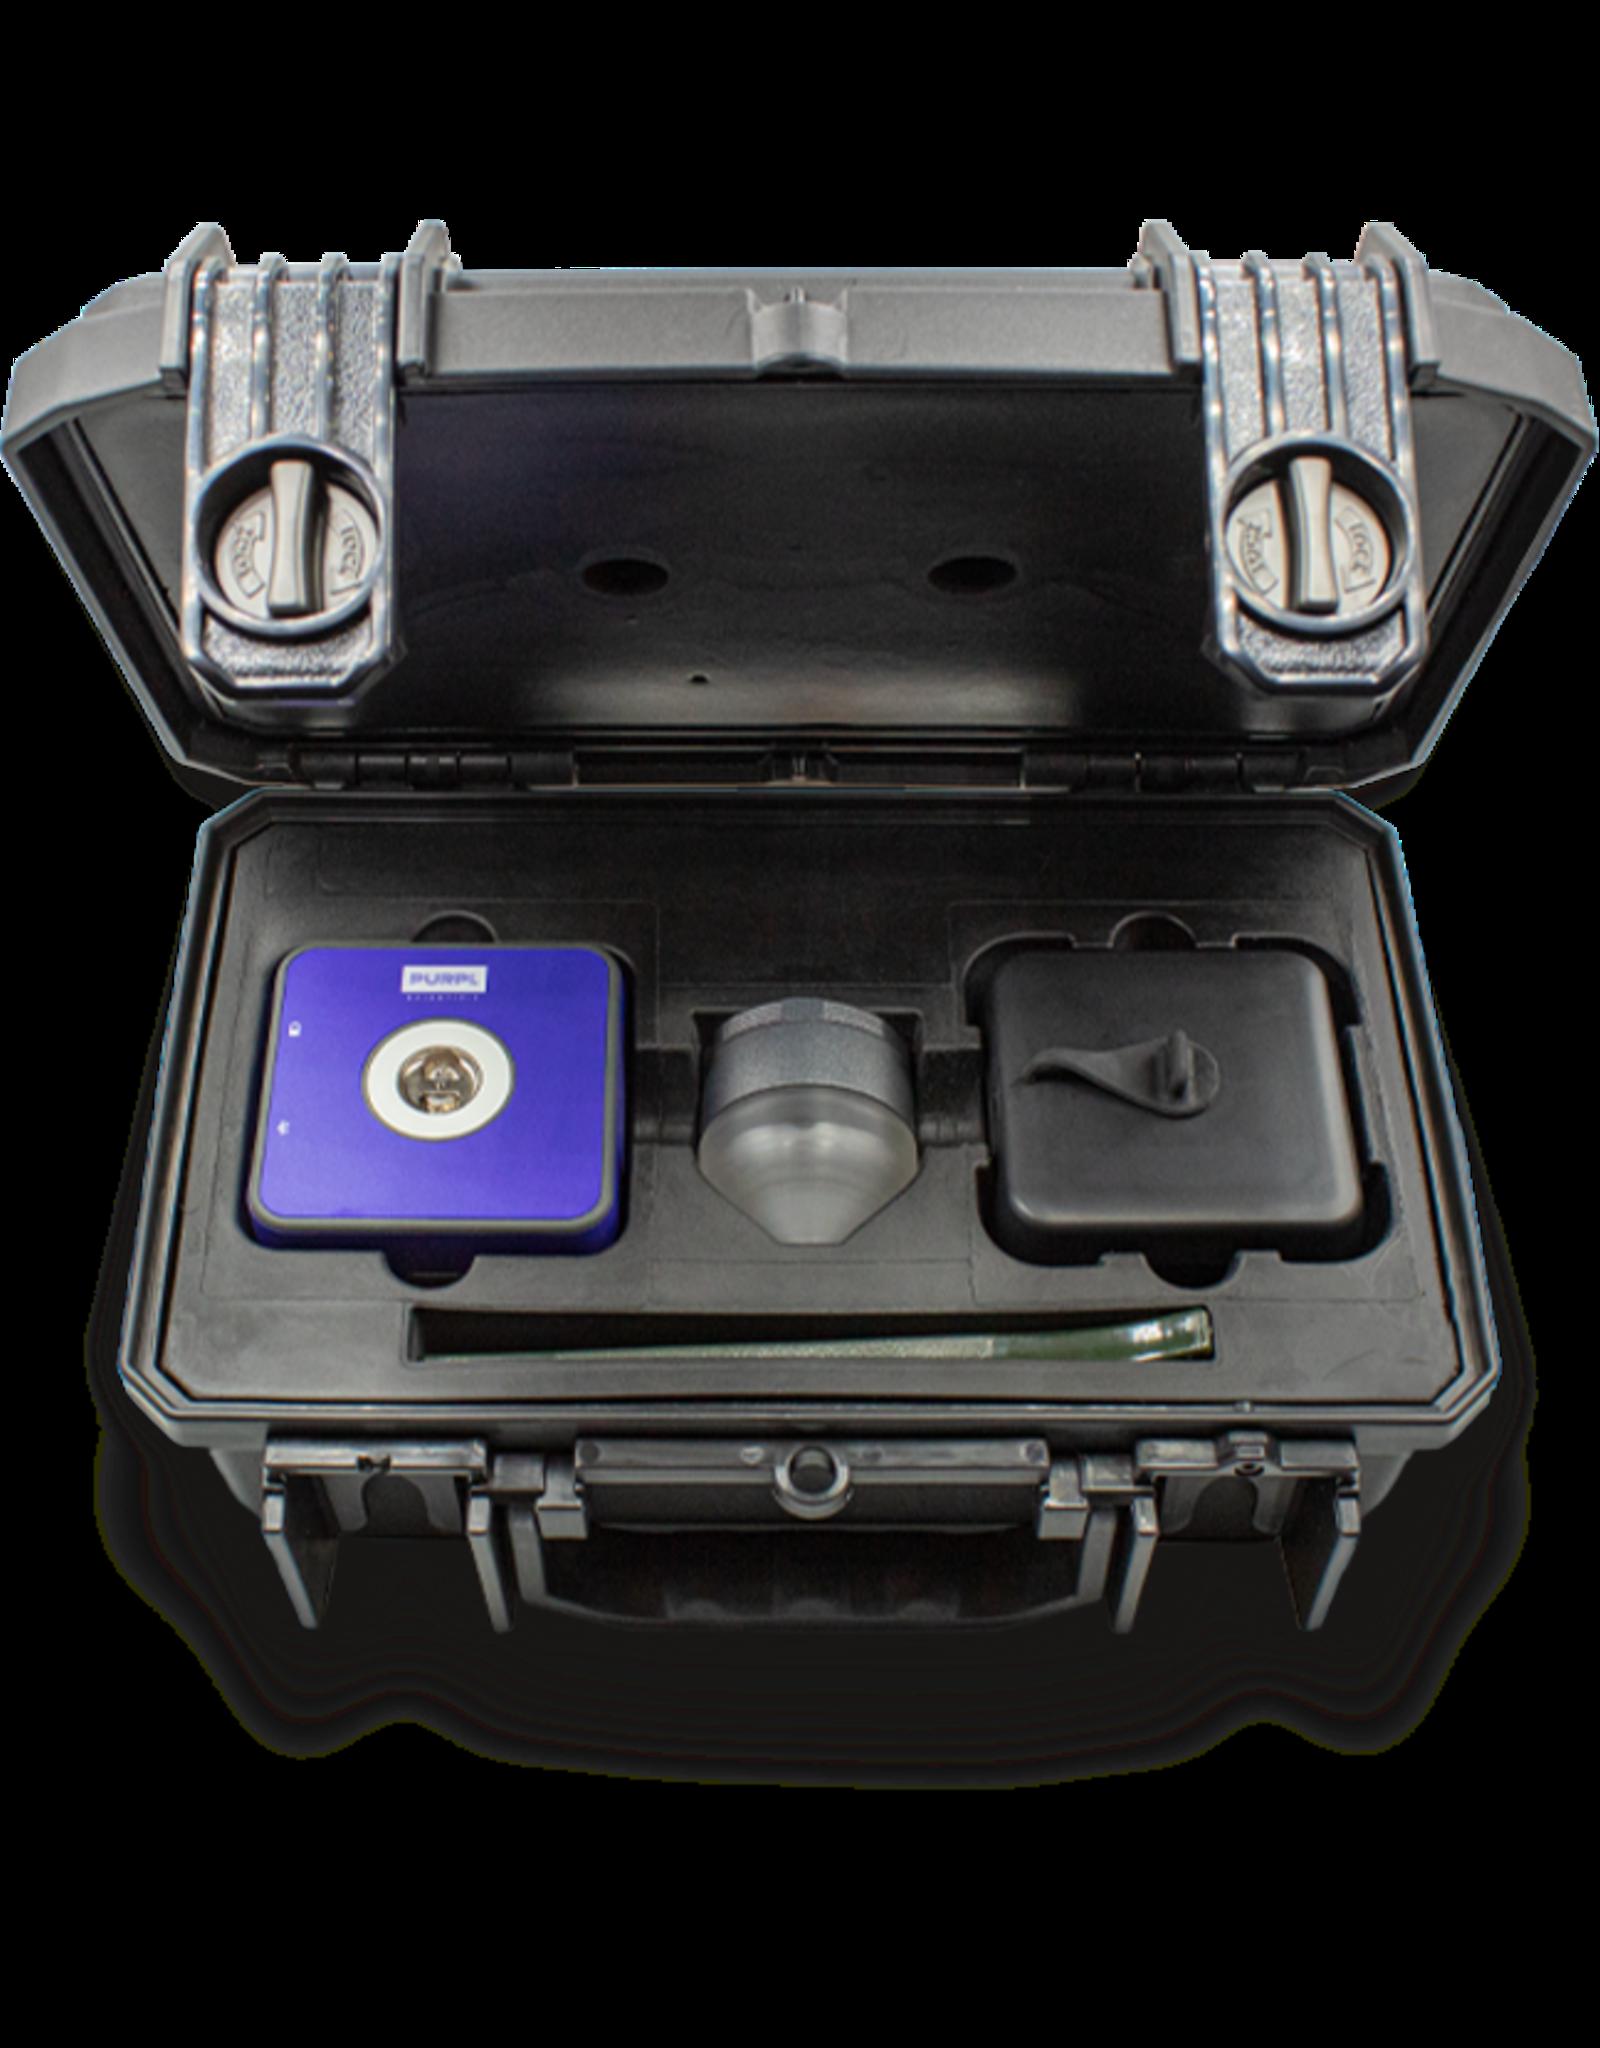 Purpl Pro KIT - Potency Measurement Device